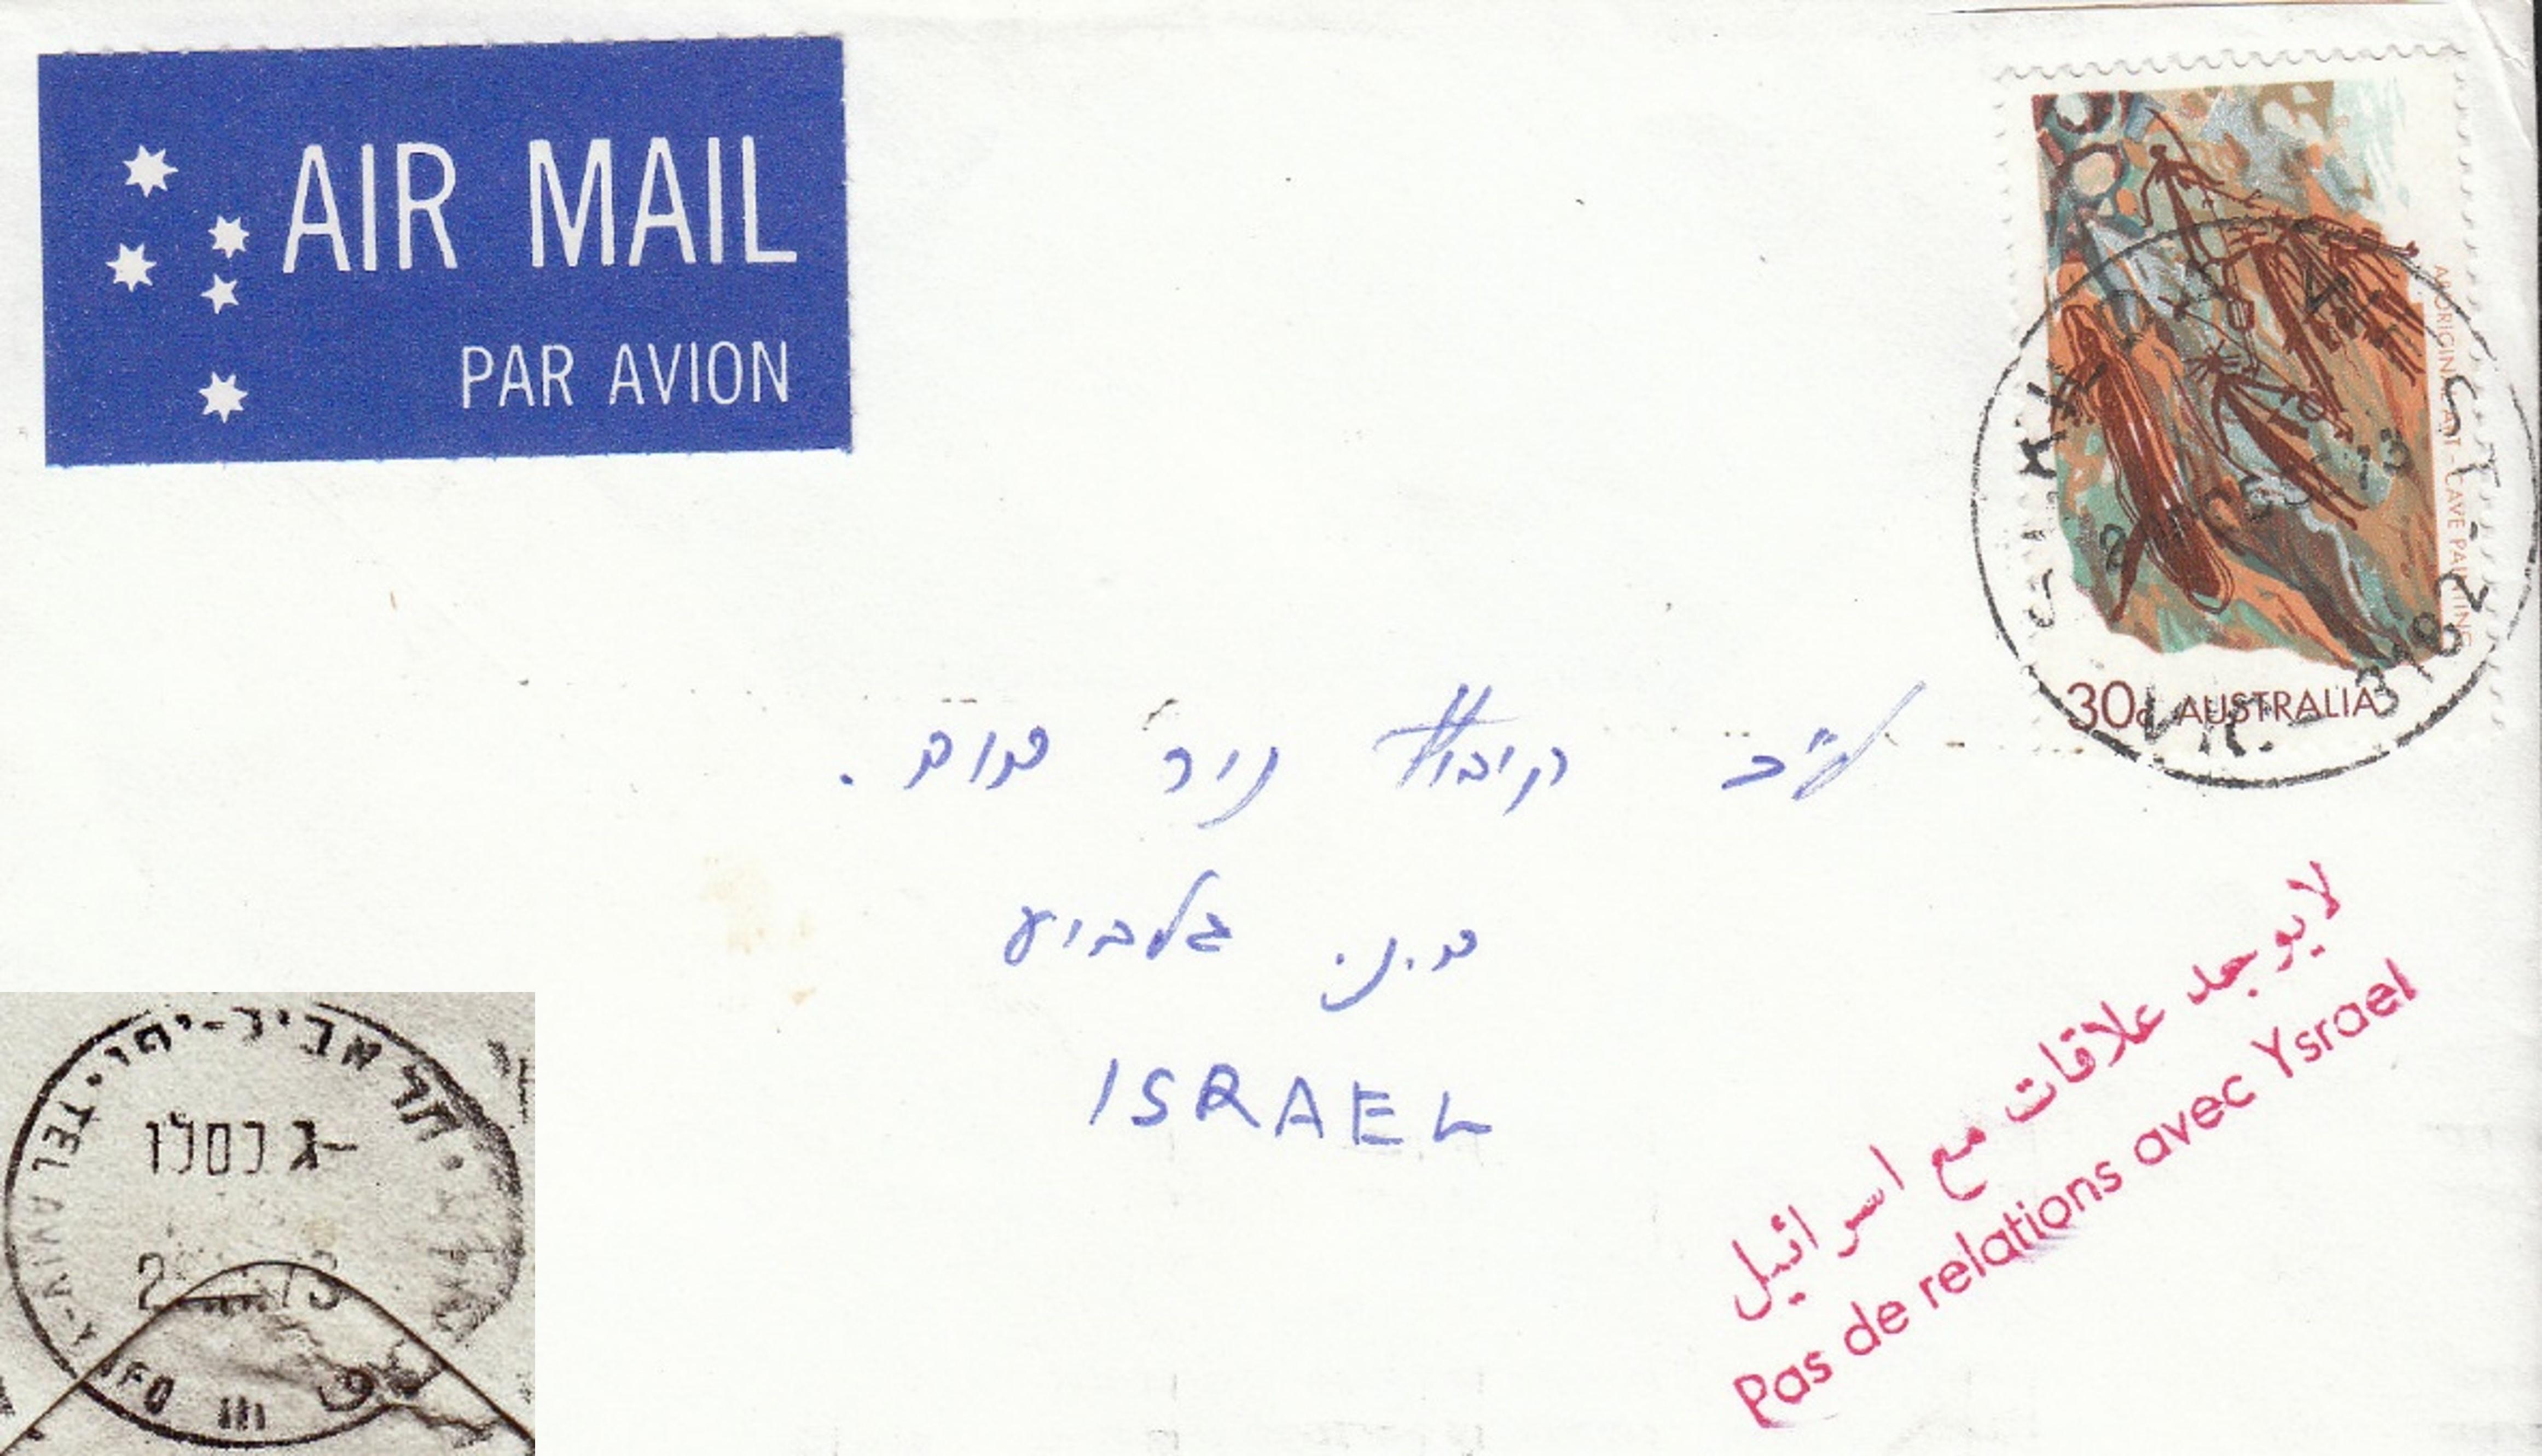 Lebanese postal boycott of Israel: 25 OCT 1973 comm a/m cv ex ST KILDA WEST Australia to KIBBUTZ NIR DAVID, franked 30d & tied by strike of local pmk; misrouted via LEBANON (b/s la